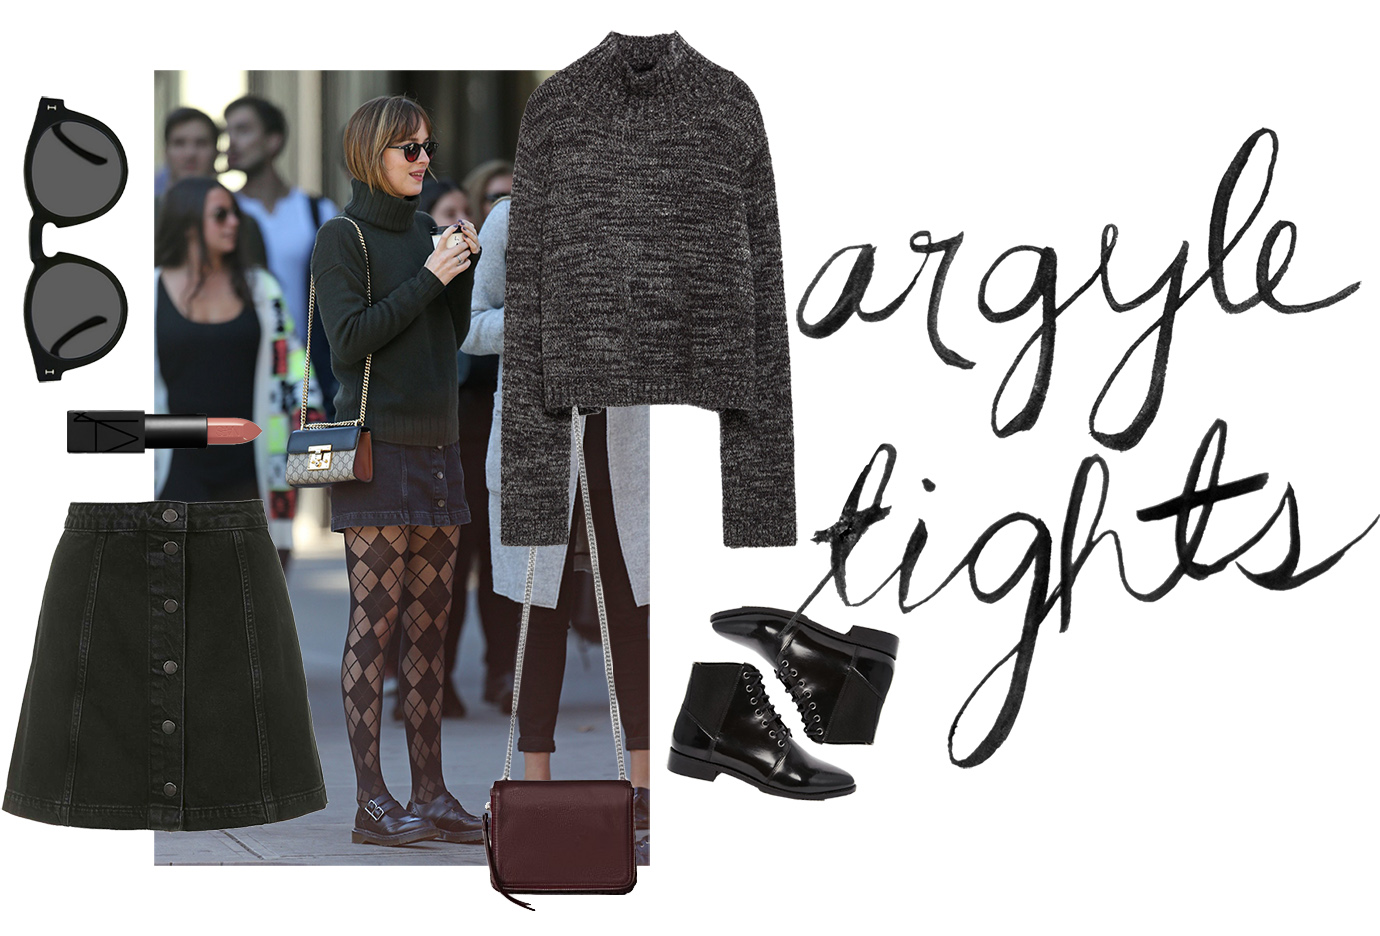 alice olivia, argyle tights, dakota johnson, street style, celebrity style, printed tights